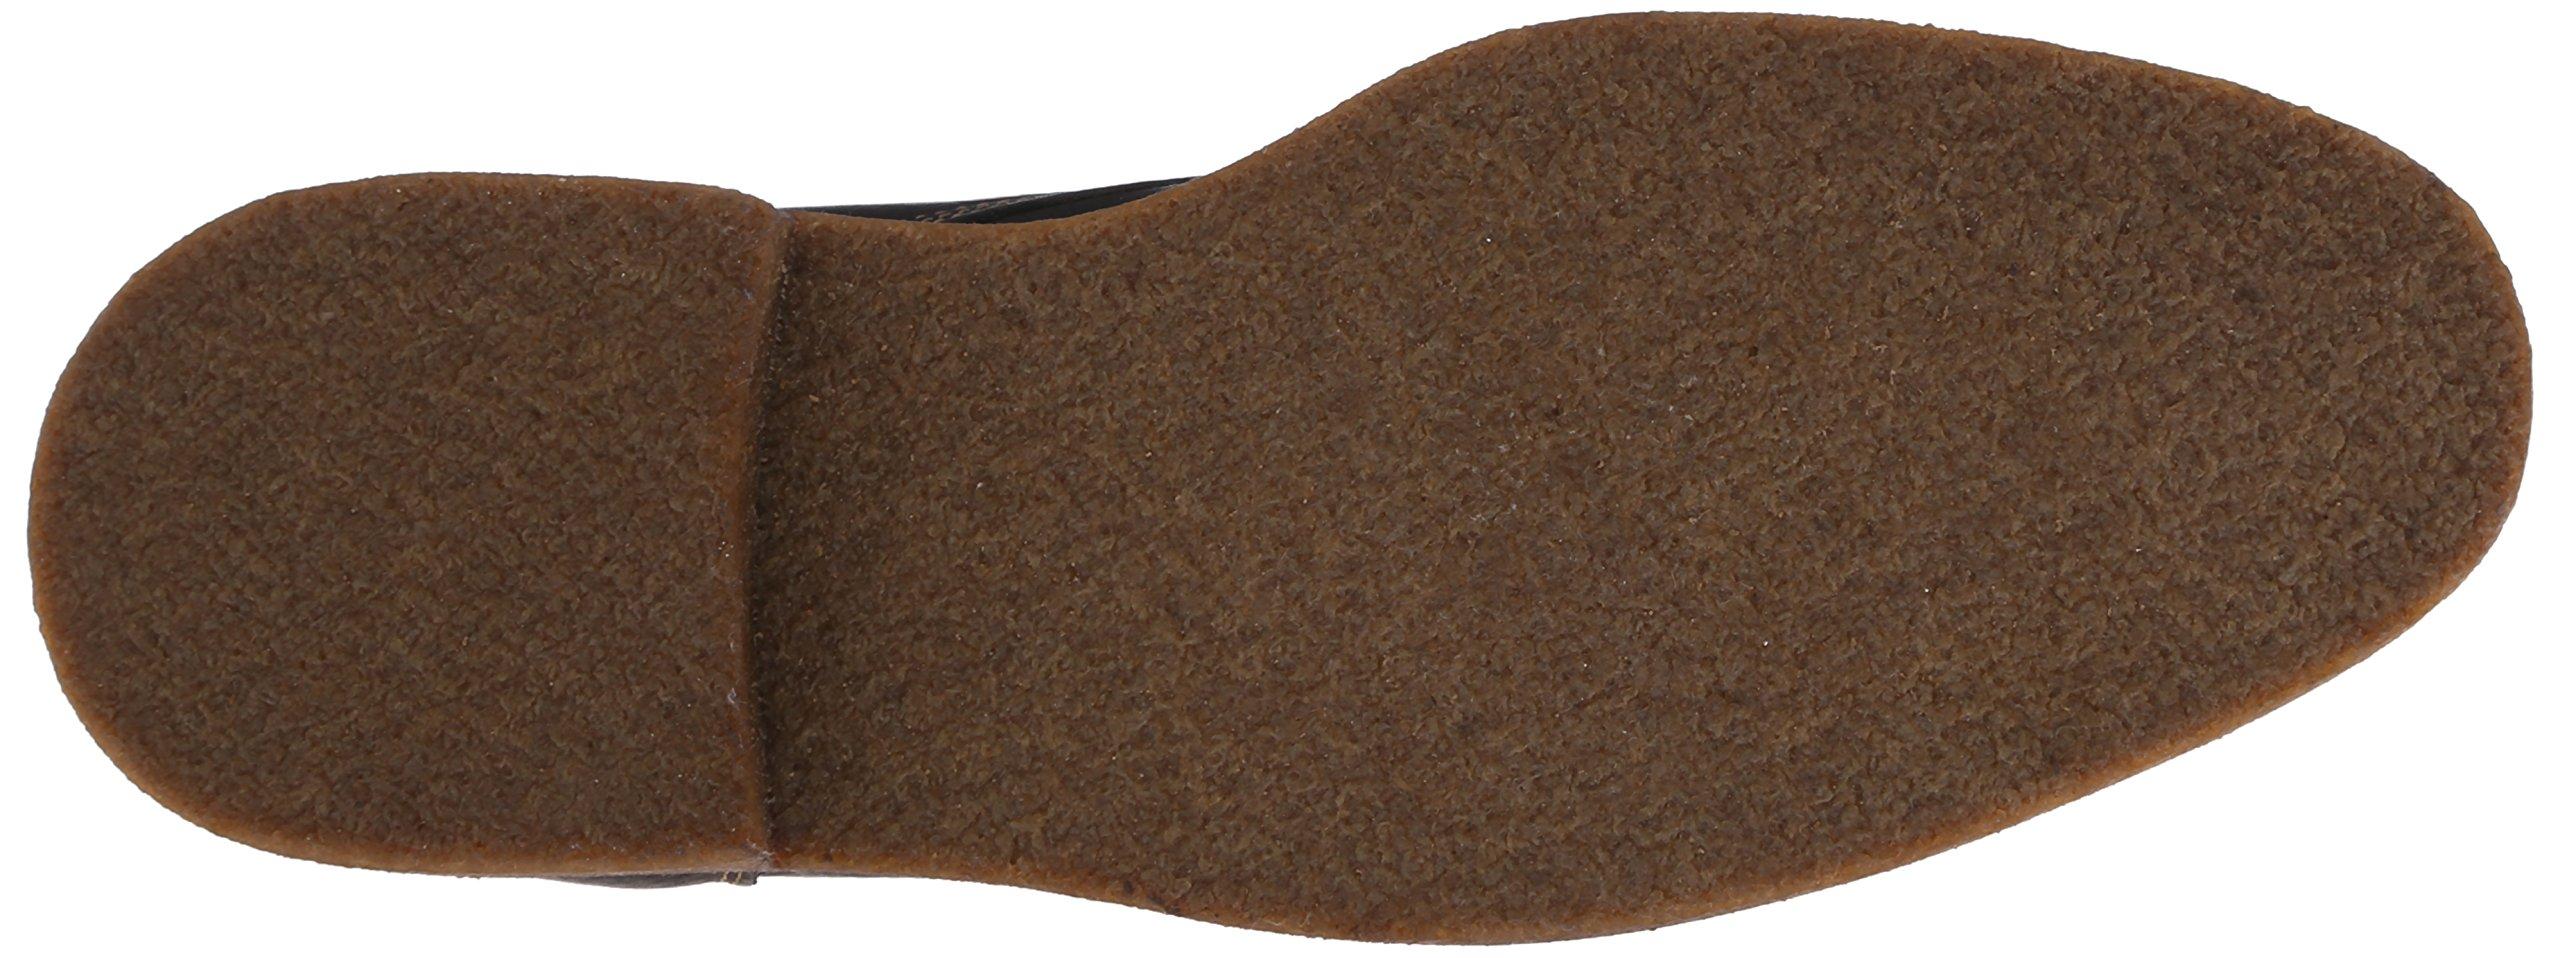 Johnston & Murphy Men's Copeland Chukka Casual Boot Classic Design Crepe Rubber Sole Memory-Foam Cushioning Water-Resistant